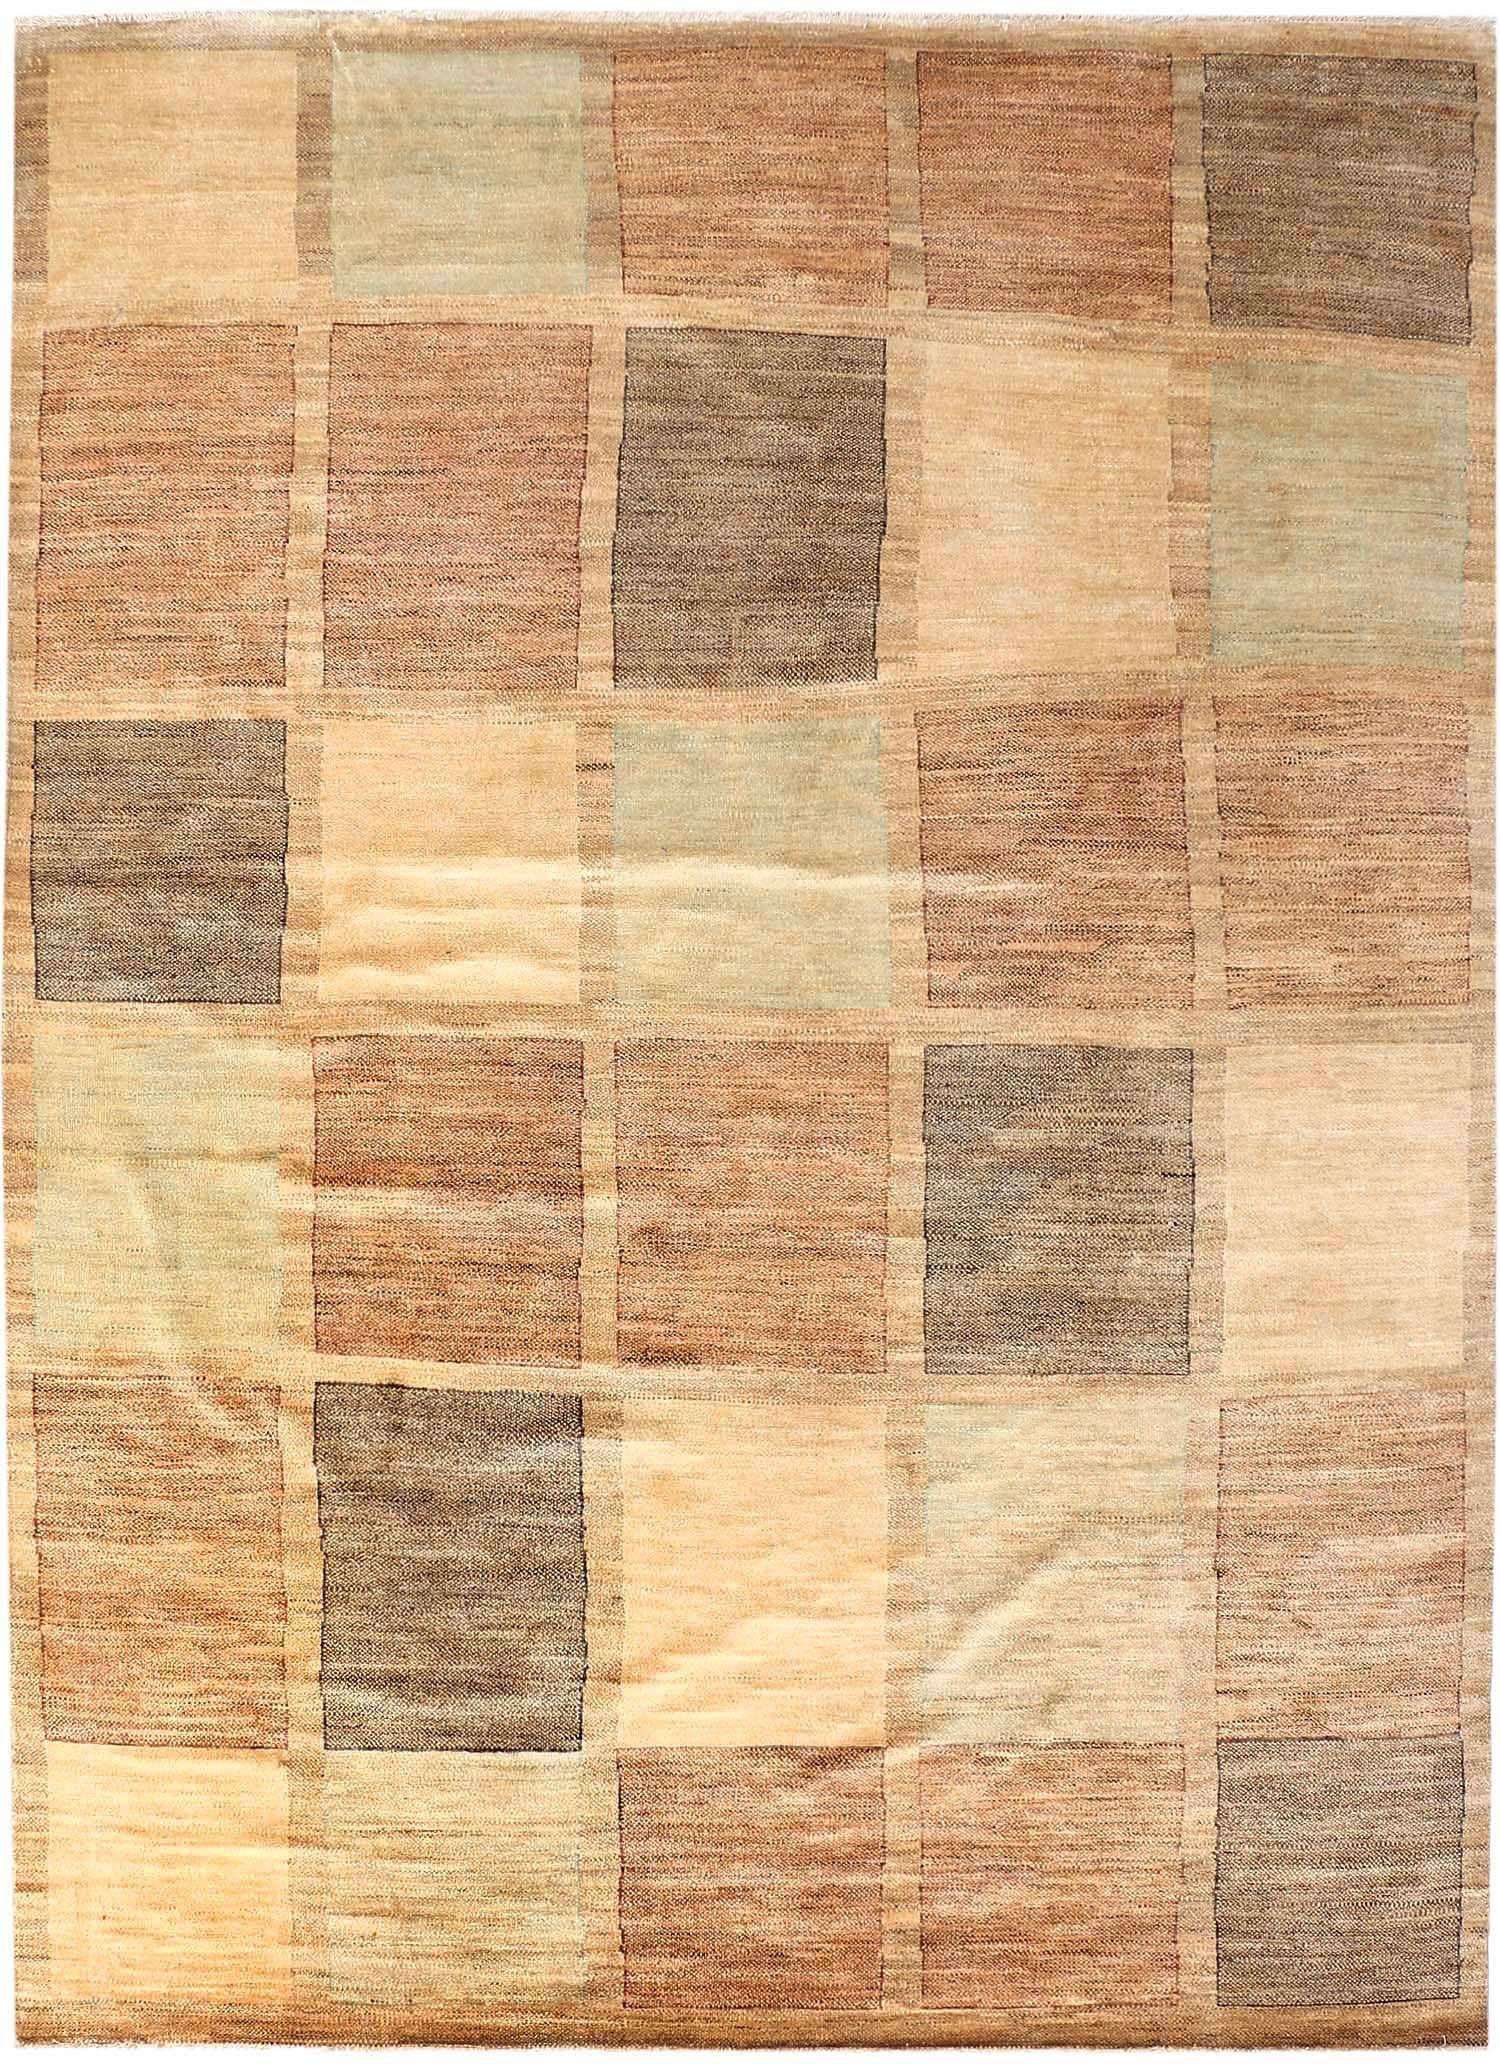 9' 1 x 12' 5 Handknotted Pakistani Wool Gabbeh Carpet Rug